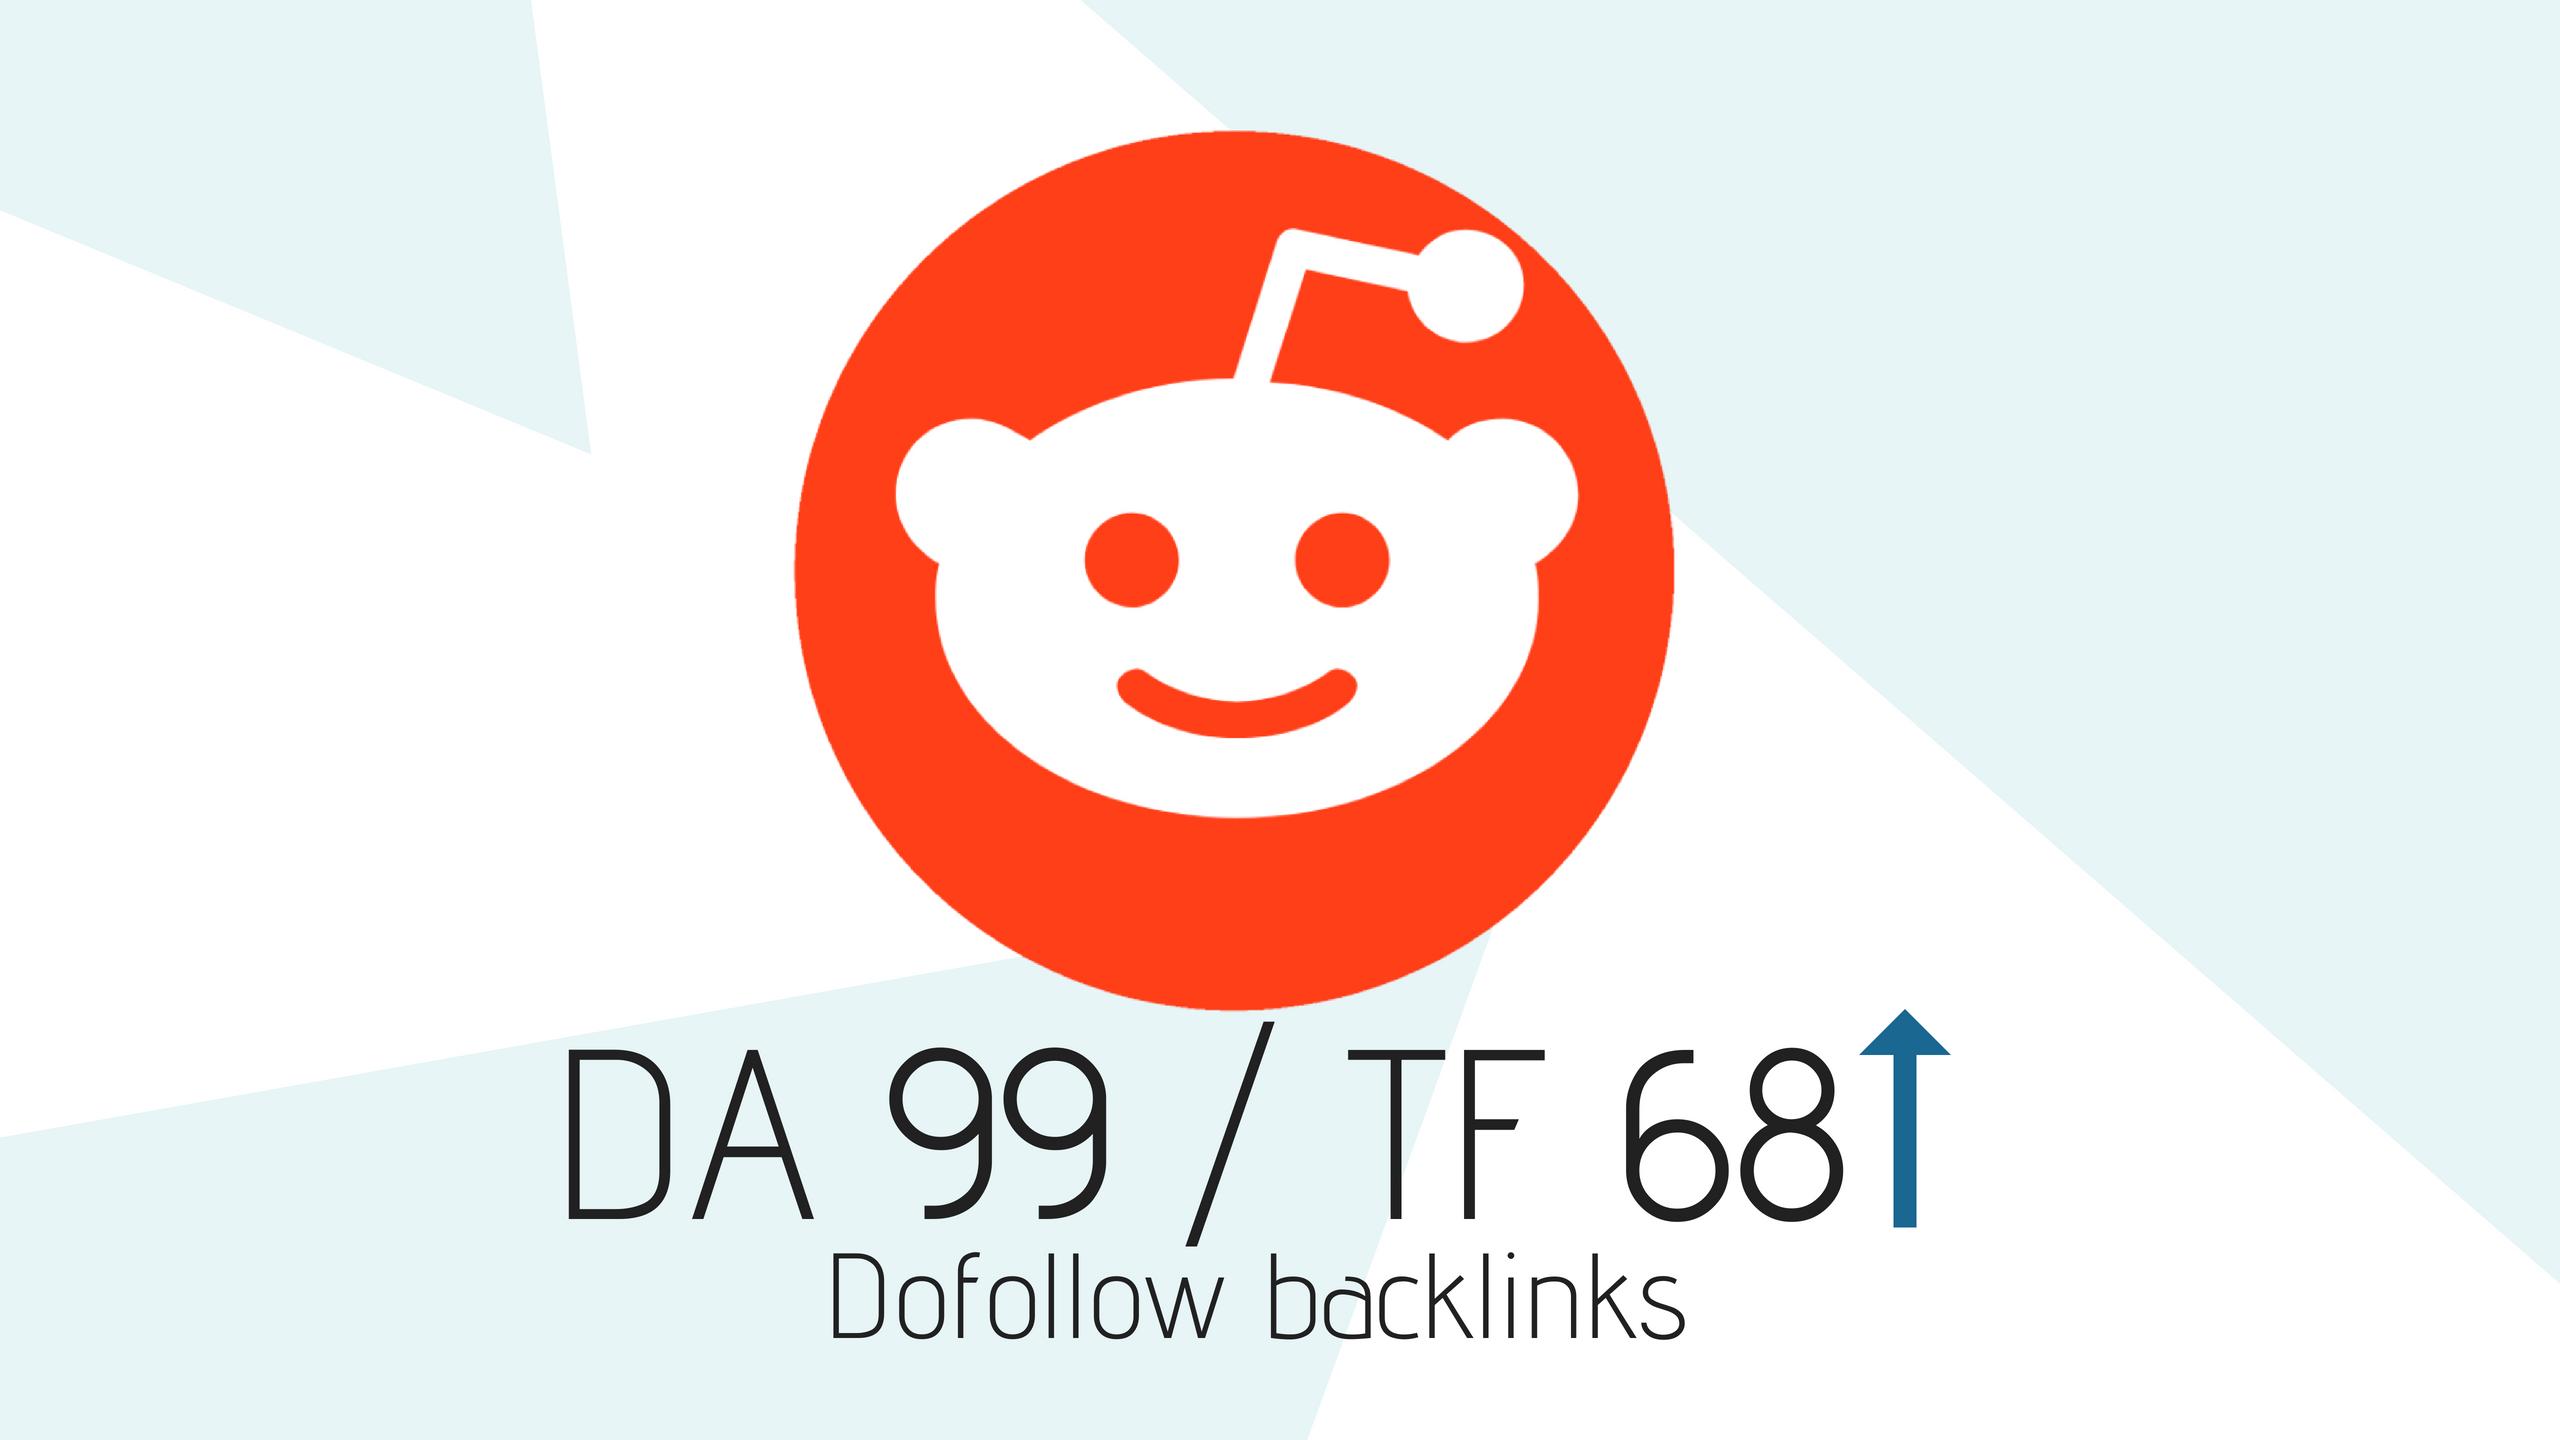 DA99 Permanent Dofollow Backlinks From Reddit | Legiit